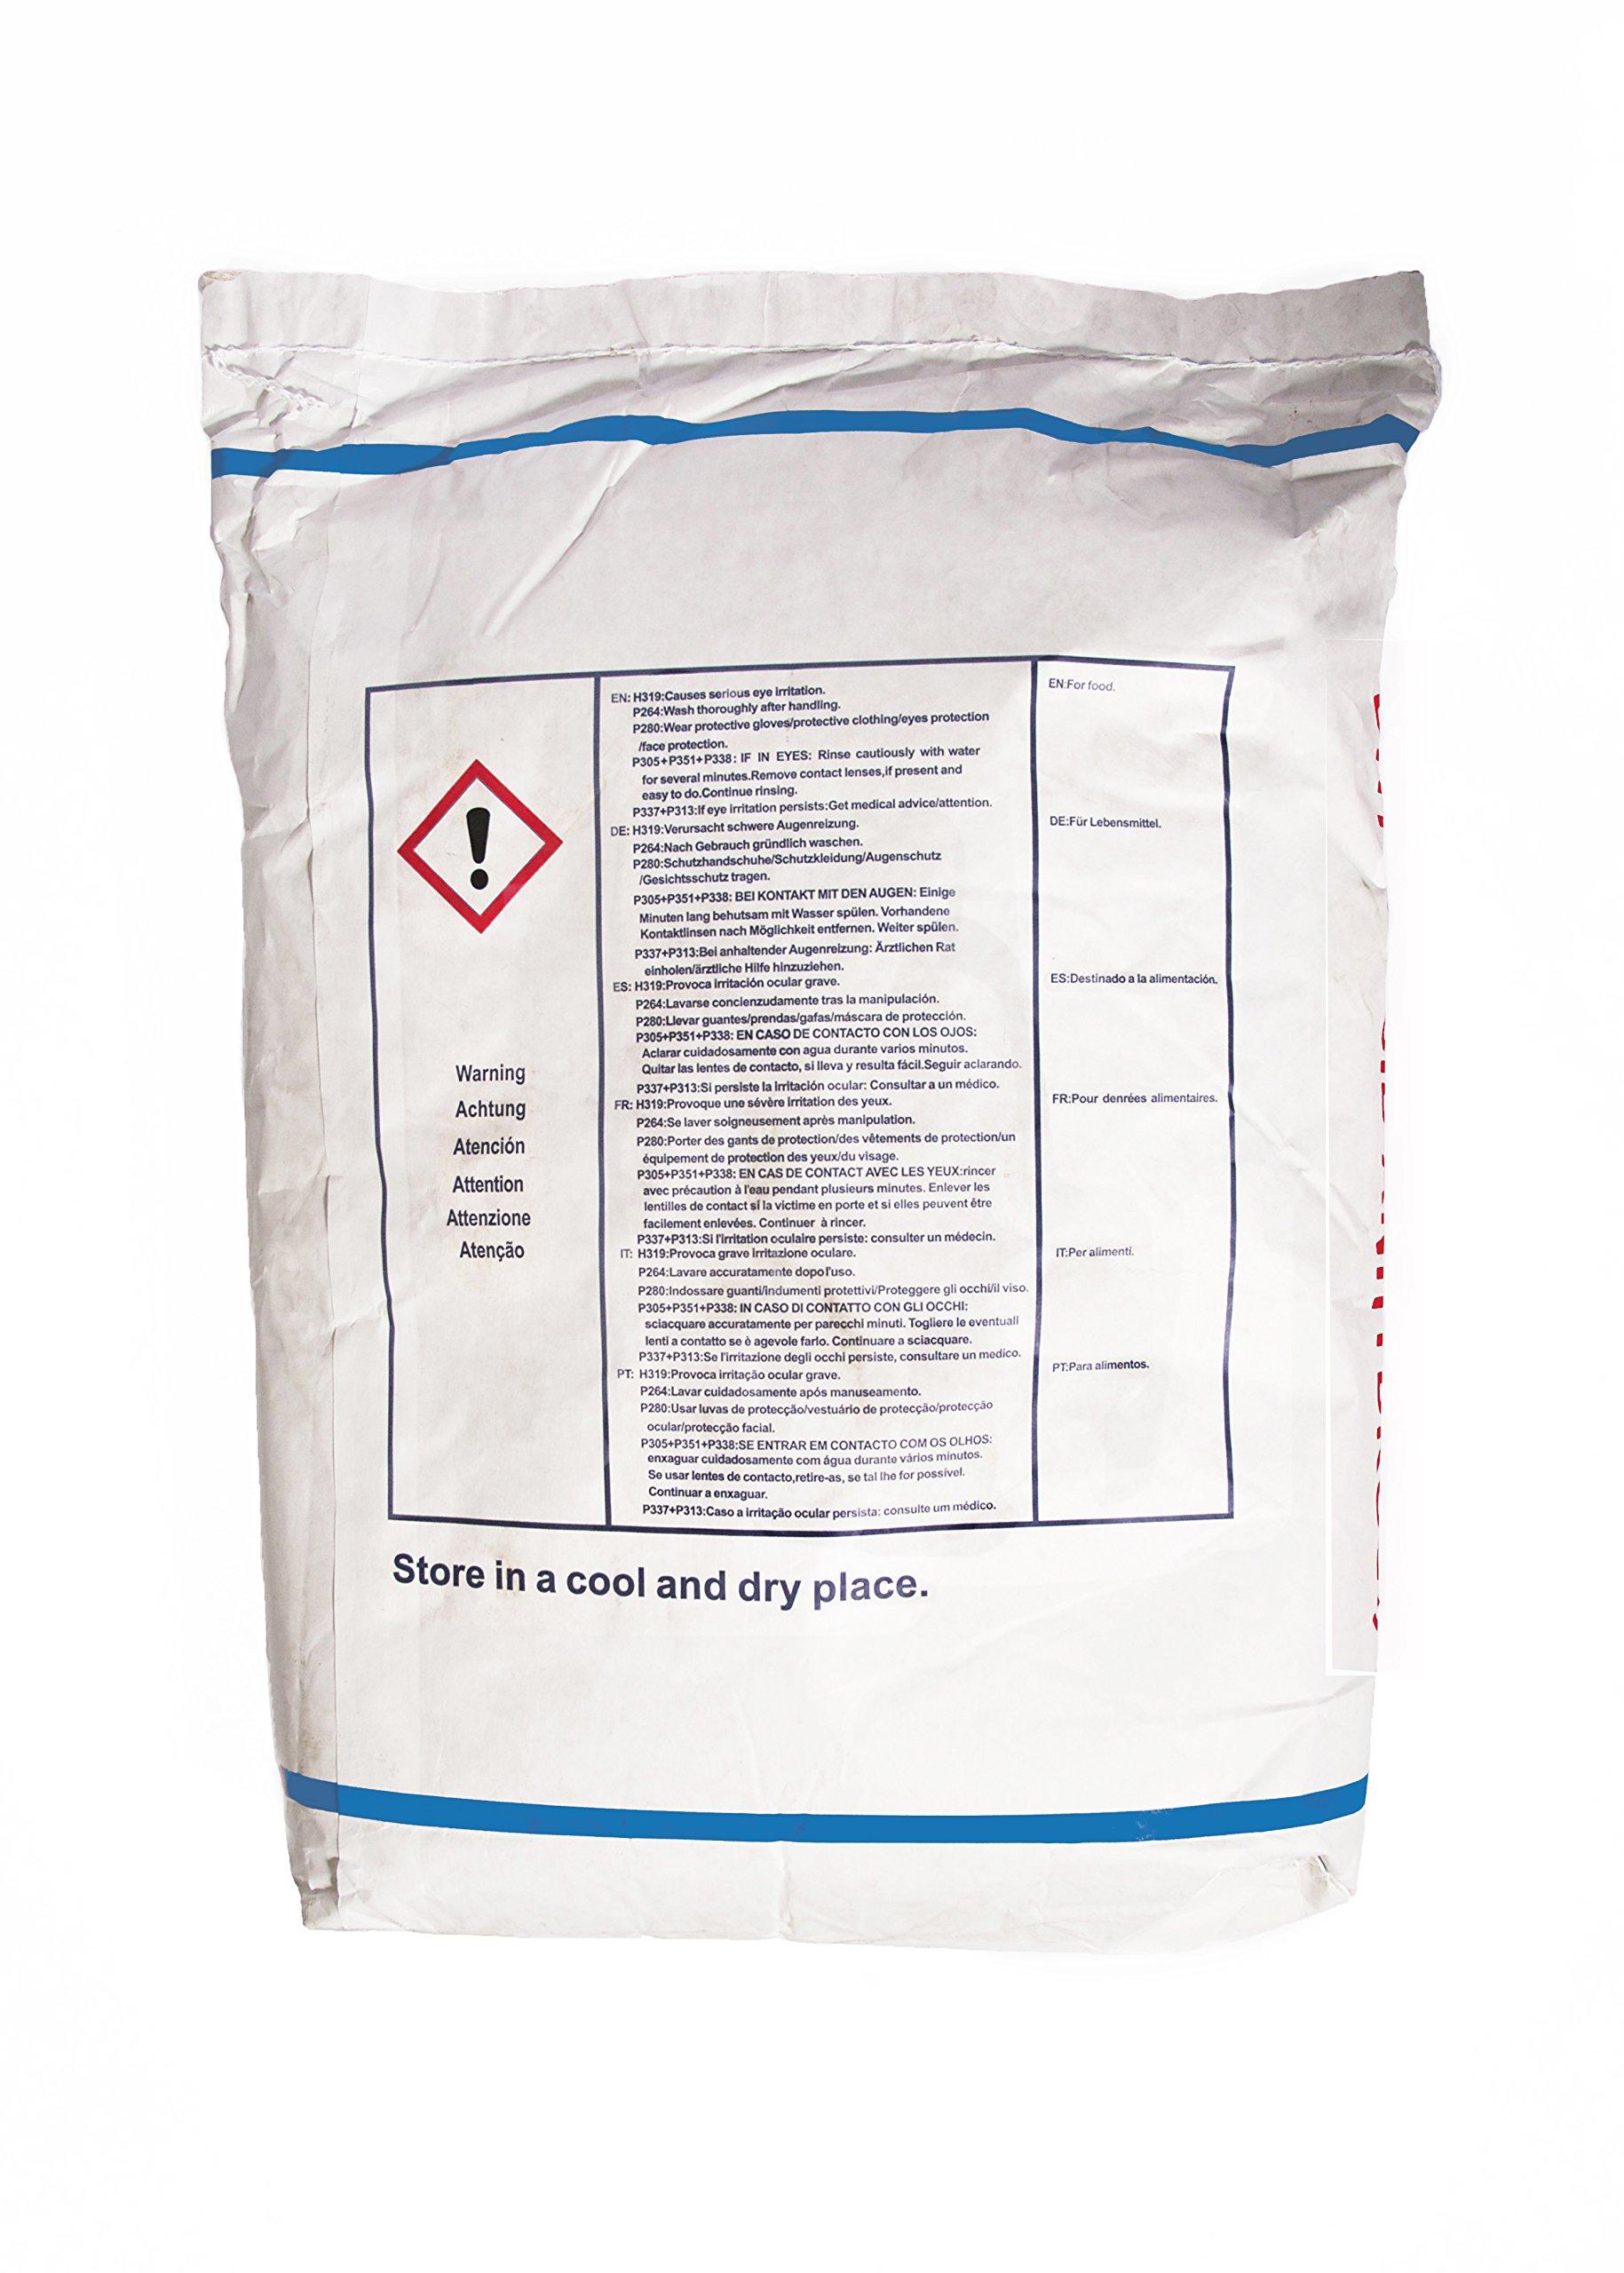 Citric Acid, Granular Anhydrous FCC/USP 99.5% - 50lb Bag by TRInternational, Inc.